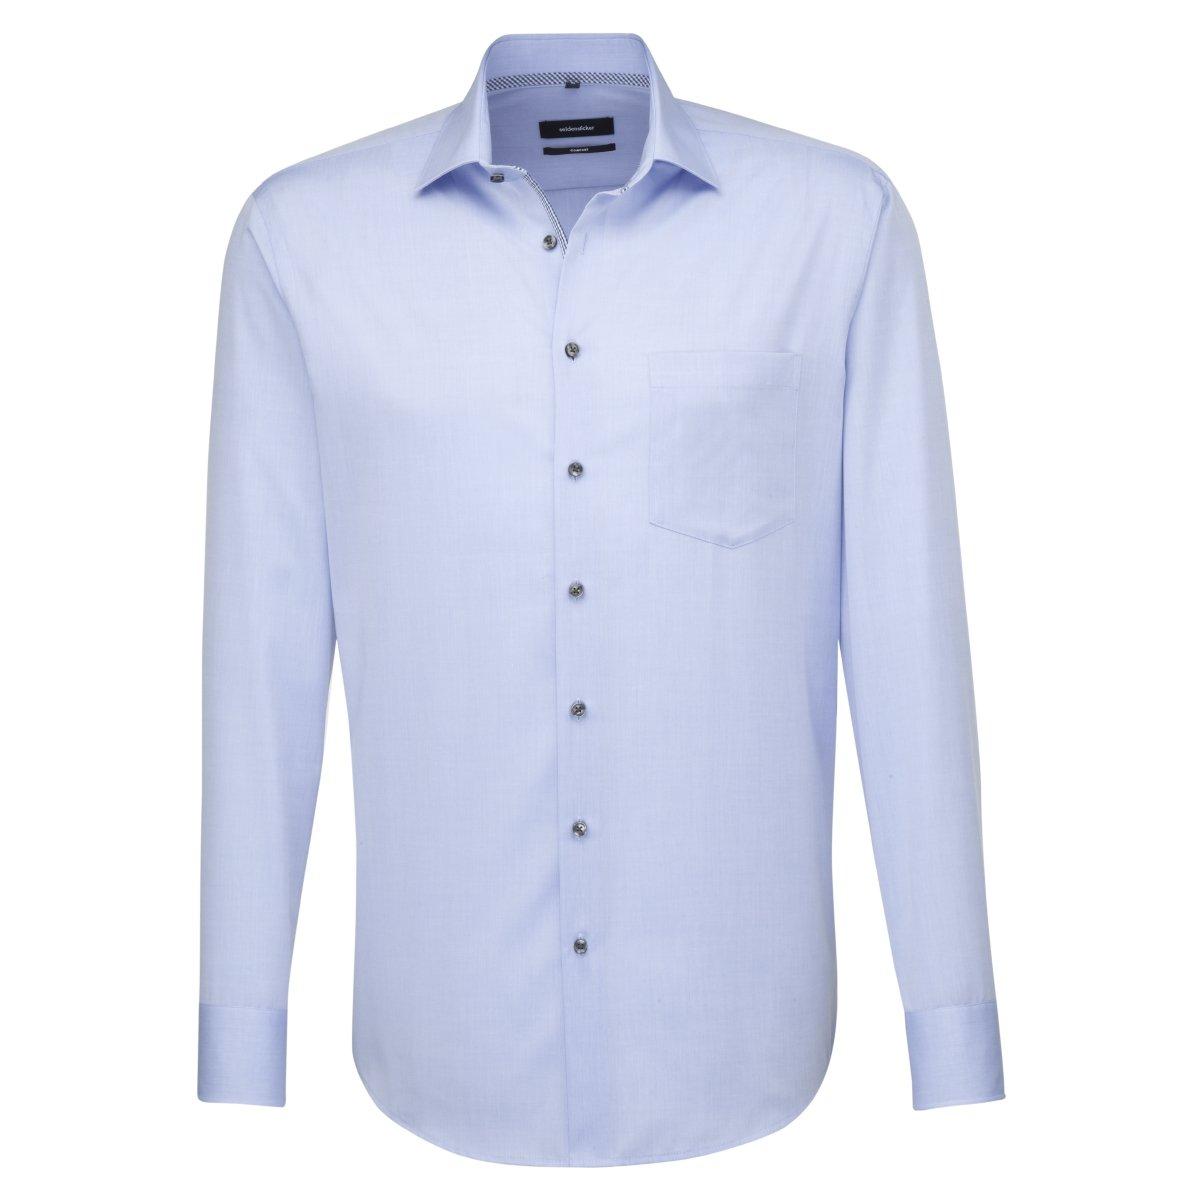 Seidensticker Comfort Bügelfrei, Camisa de Oficina para Hombre